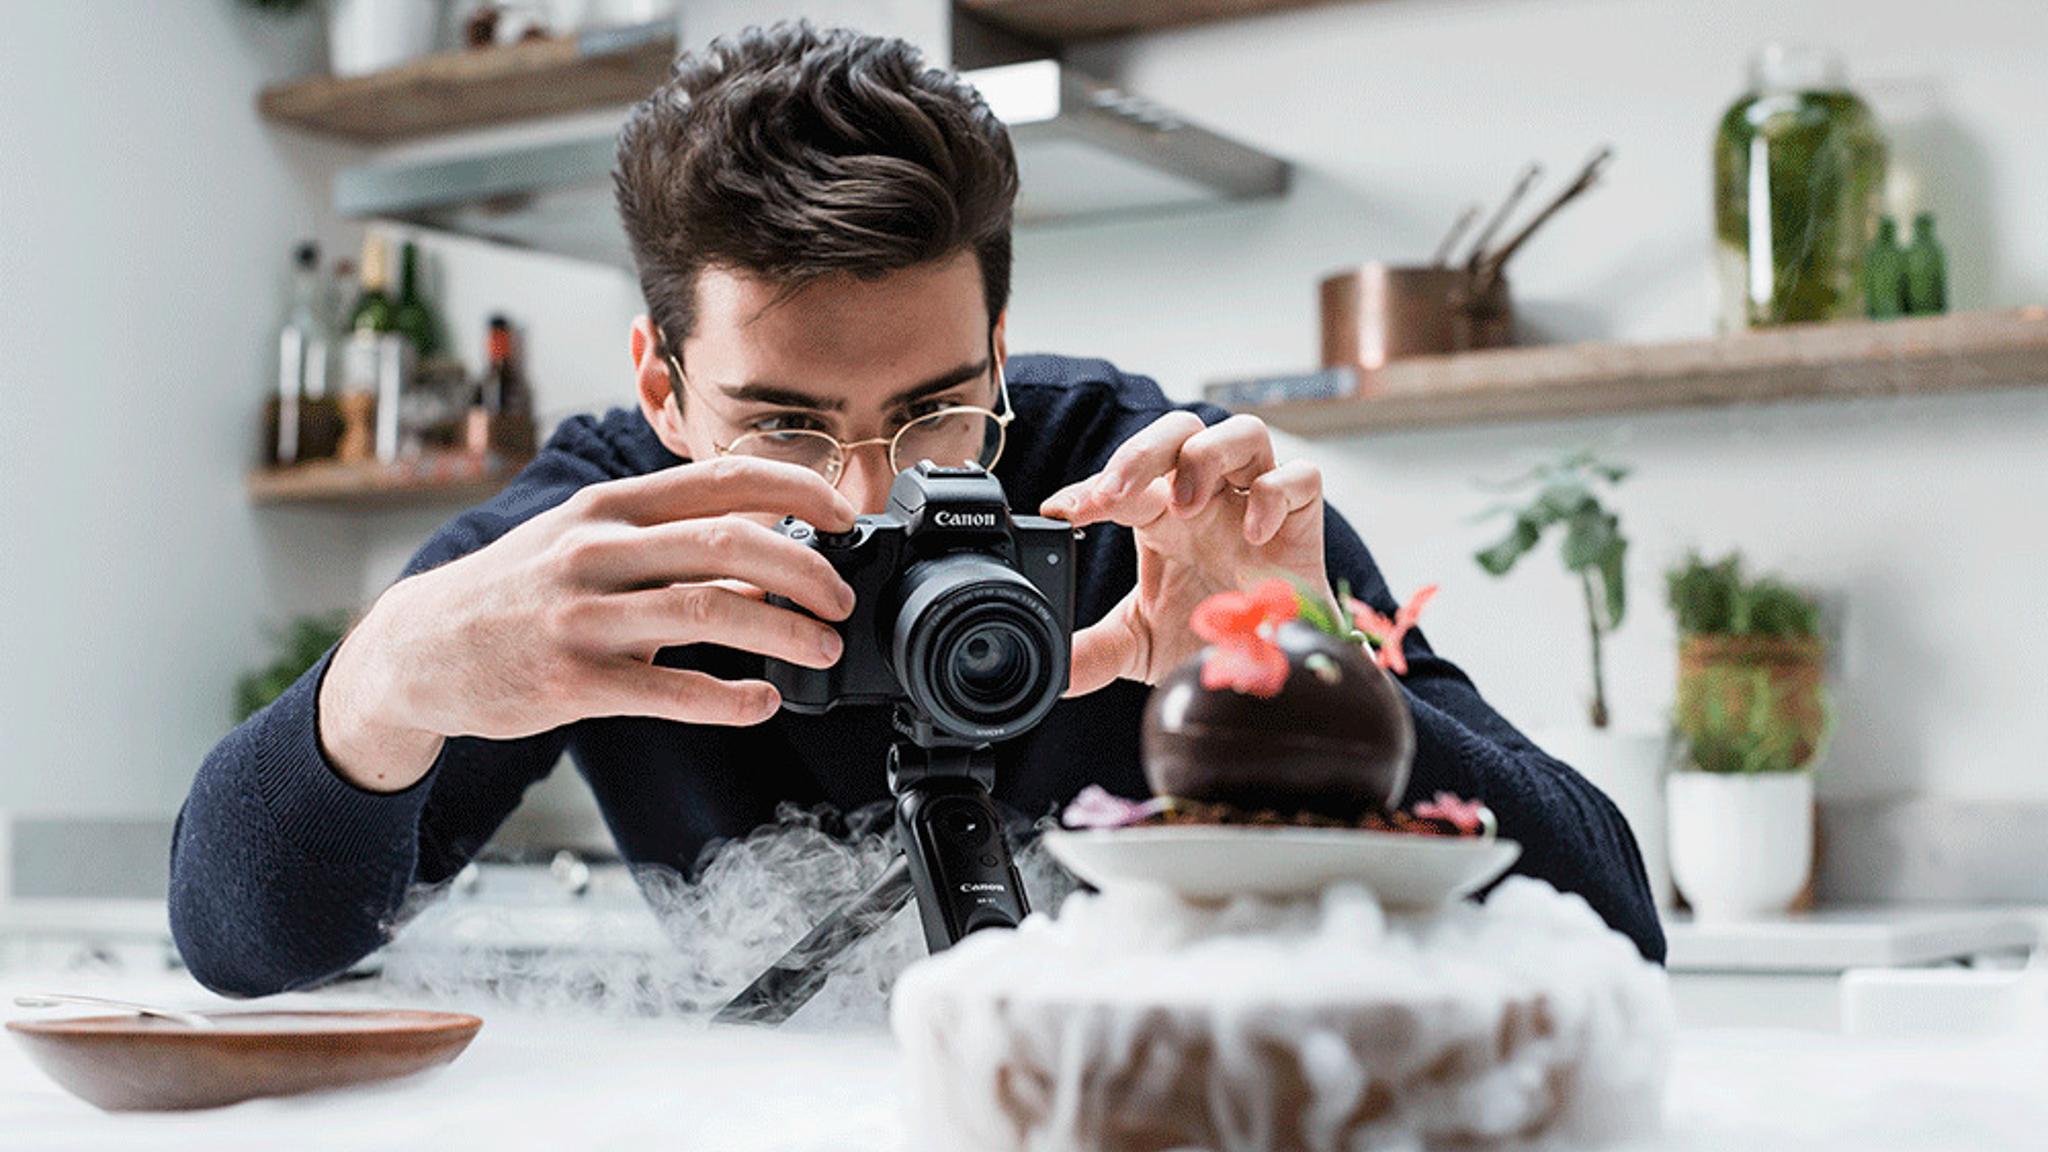 Canon EOS M50 Mark II-Black-Lifestyle-Matt-Adlard-GIF